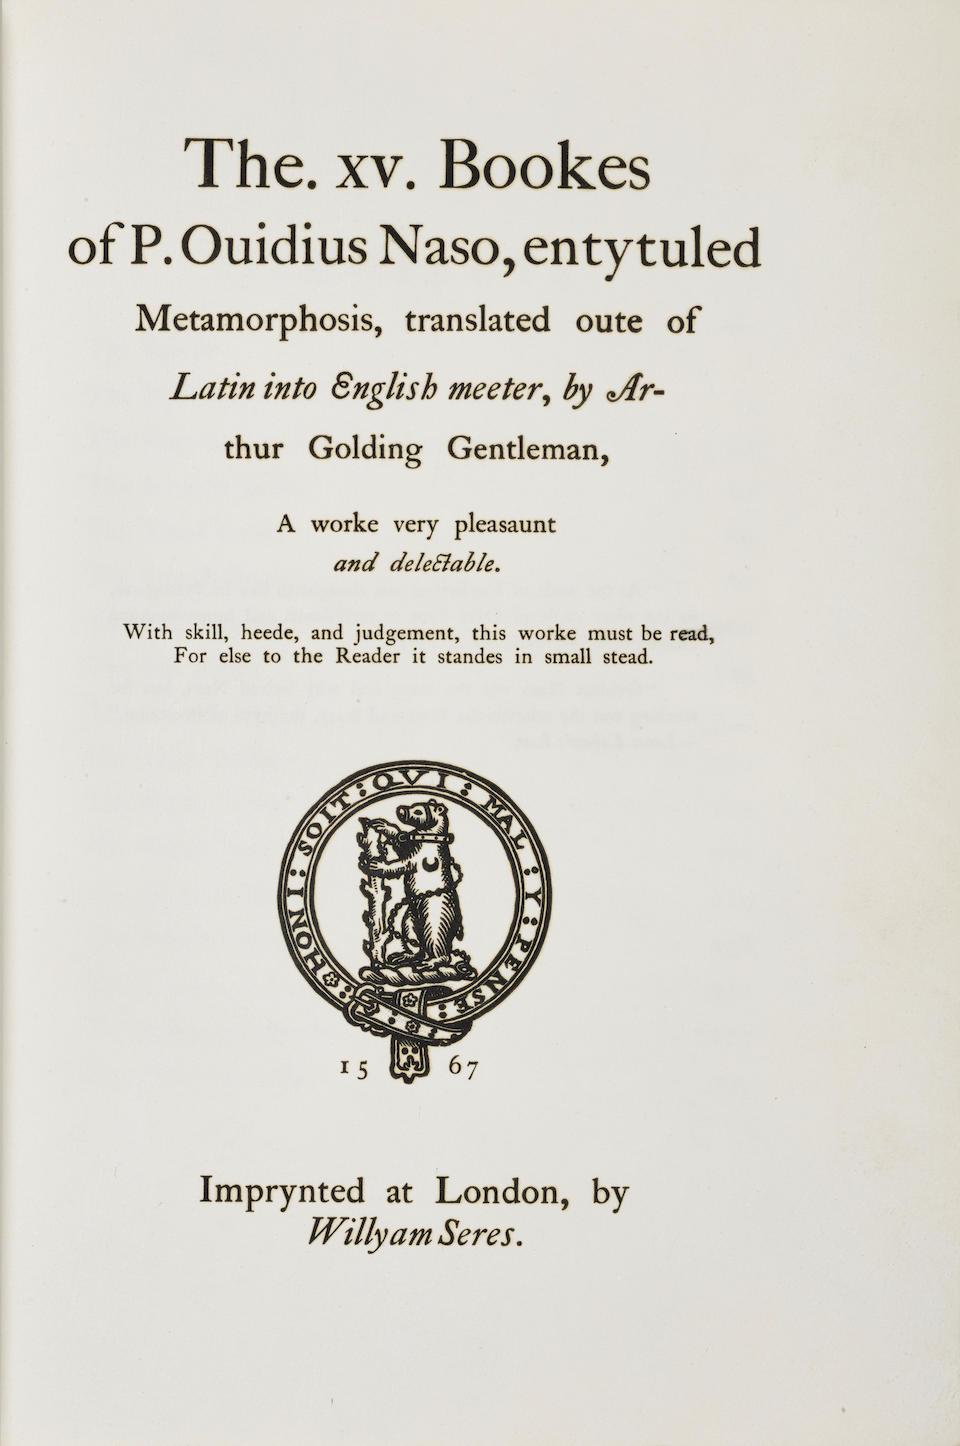 DE LA MORE PRESS. OVID. 43 B.C.E-C.17 C.E. Shakespeare's Ovid Being Arthur Golding's Translation of the Metamorphoses. London: Alexander Moring Ltd./De la More Press, 1904.